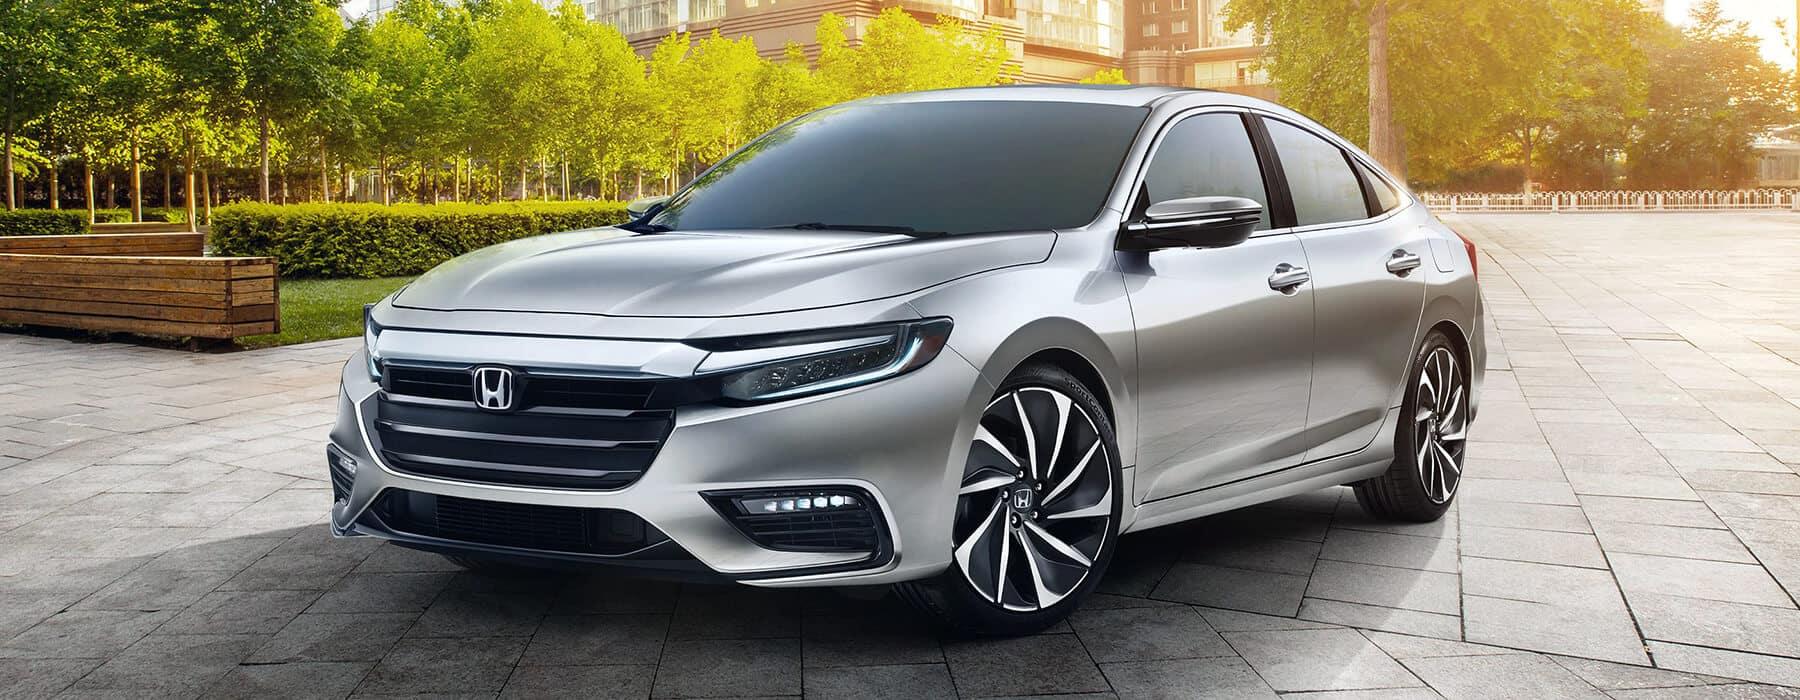 2019 Honda Insight Background